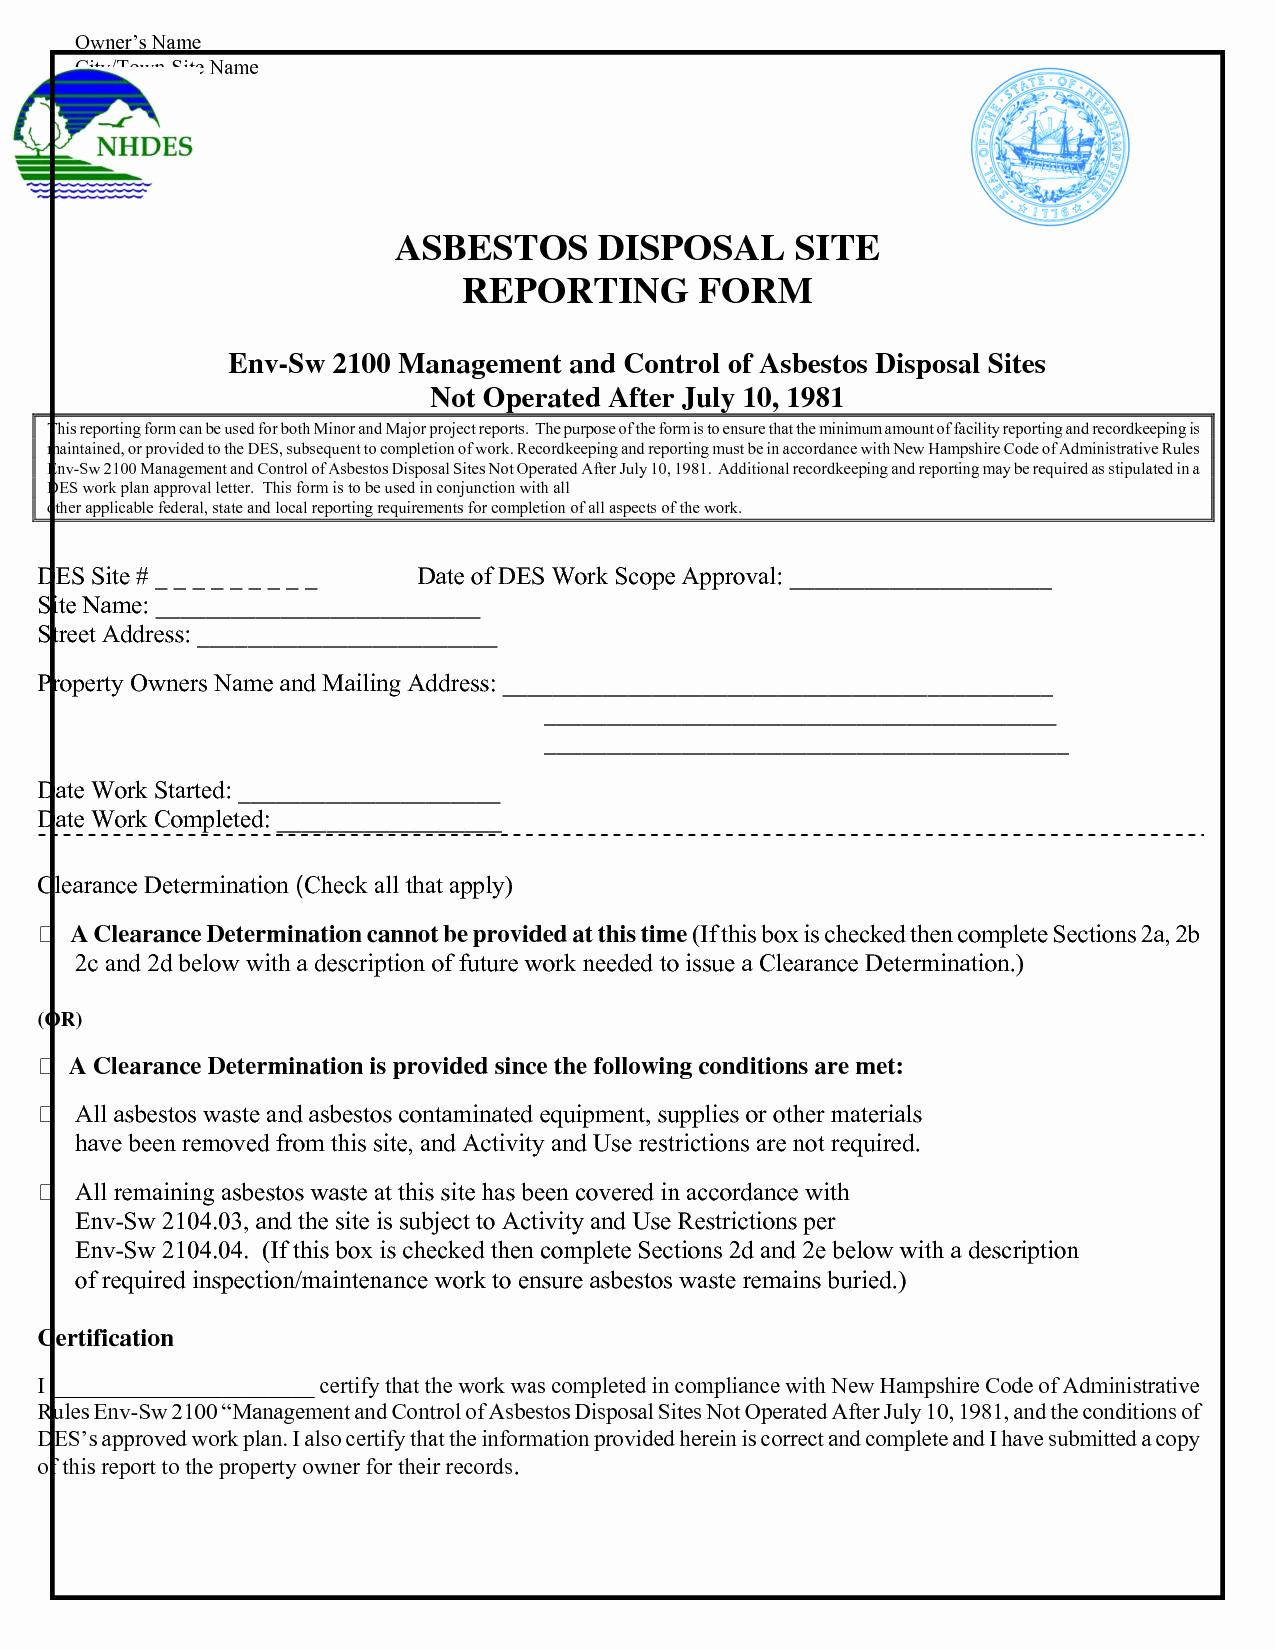 Standard Business Letter format Template Lovely Best S Of Legal Business Letter Sample Sample Legal